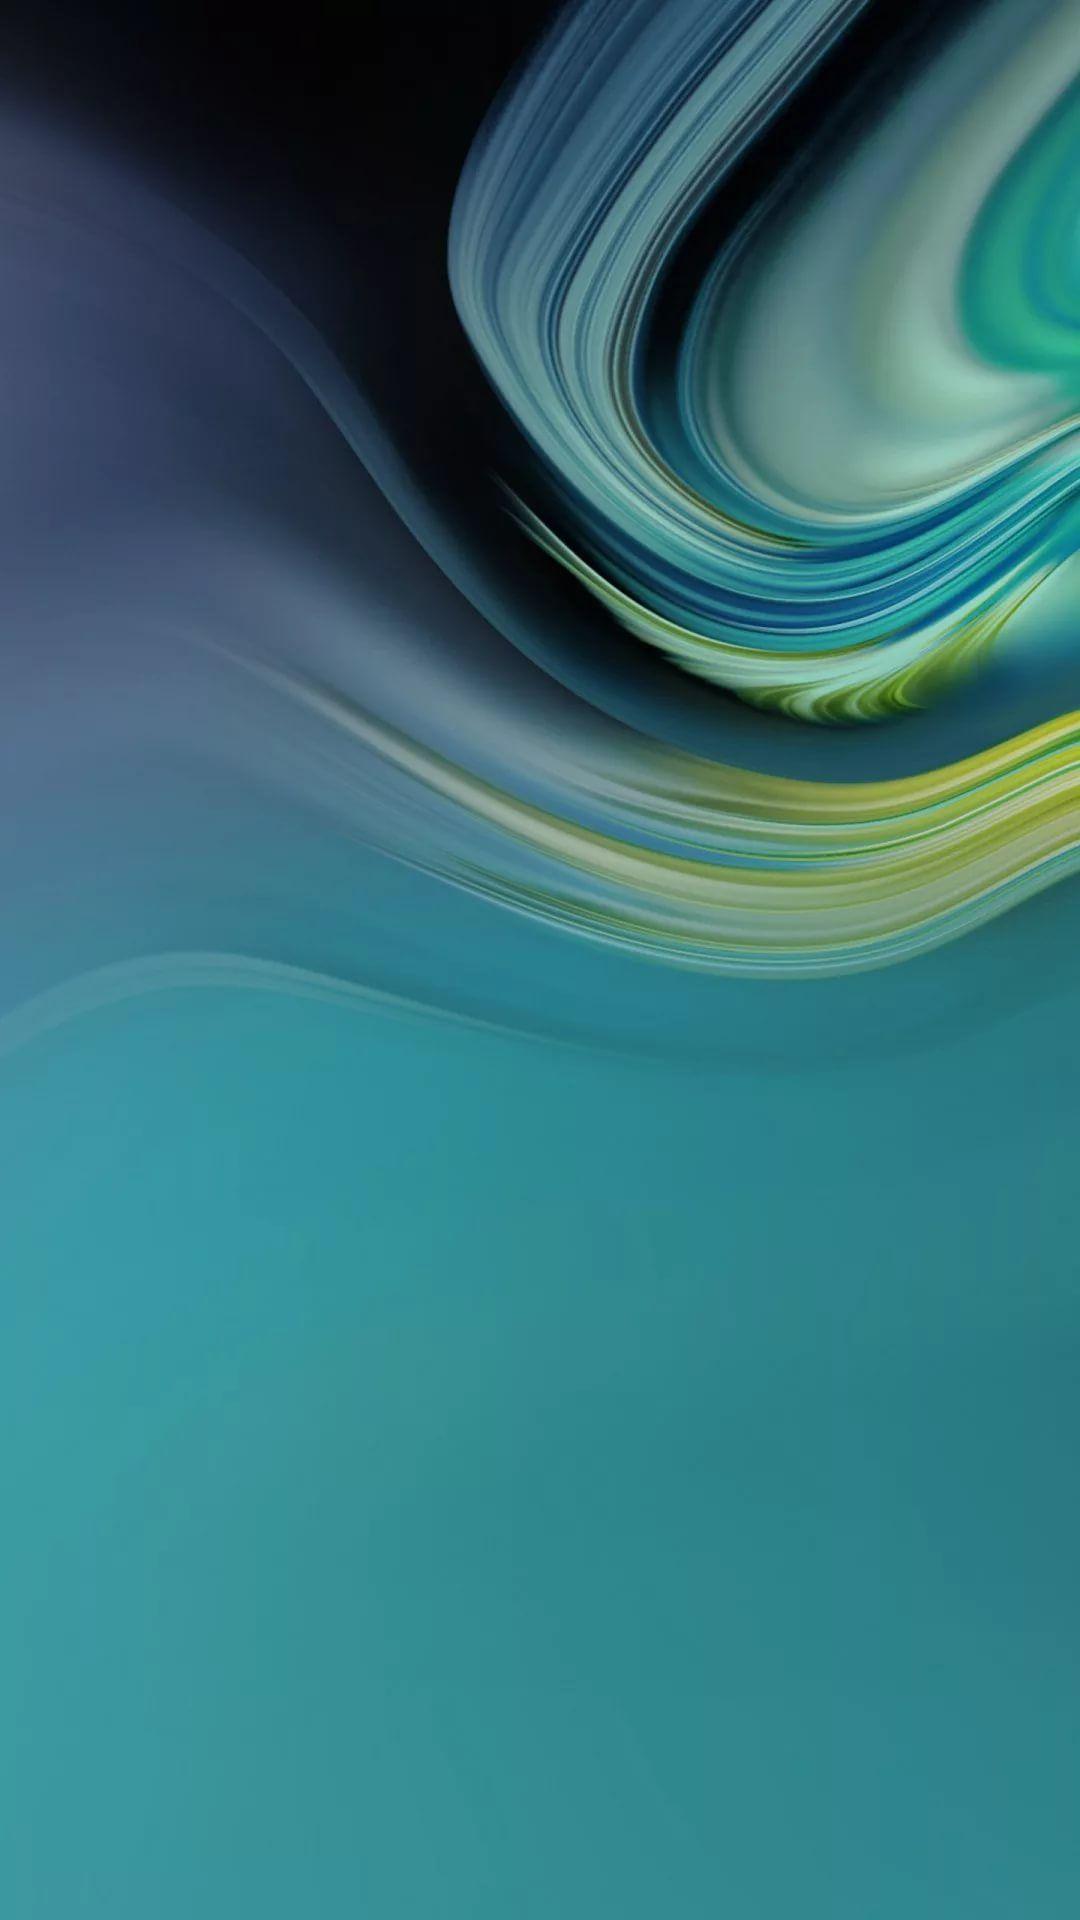 Galagy Tab Samsung Galaxy s7 wallpaper